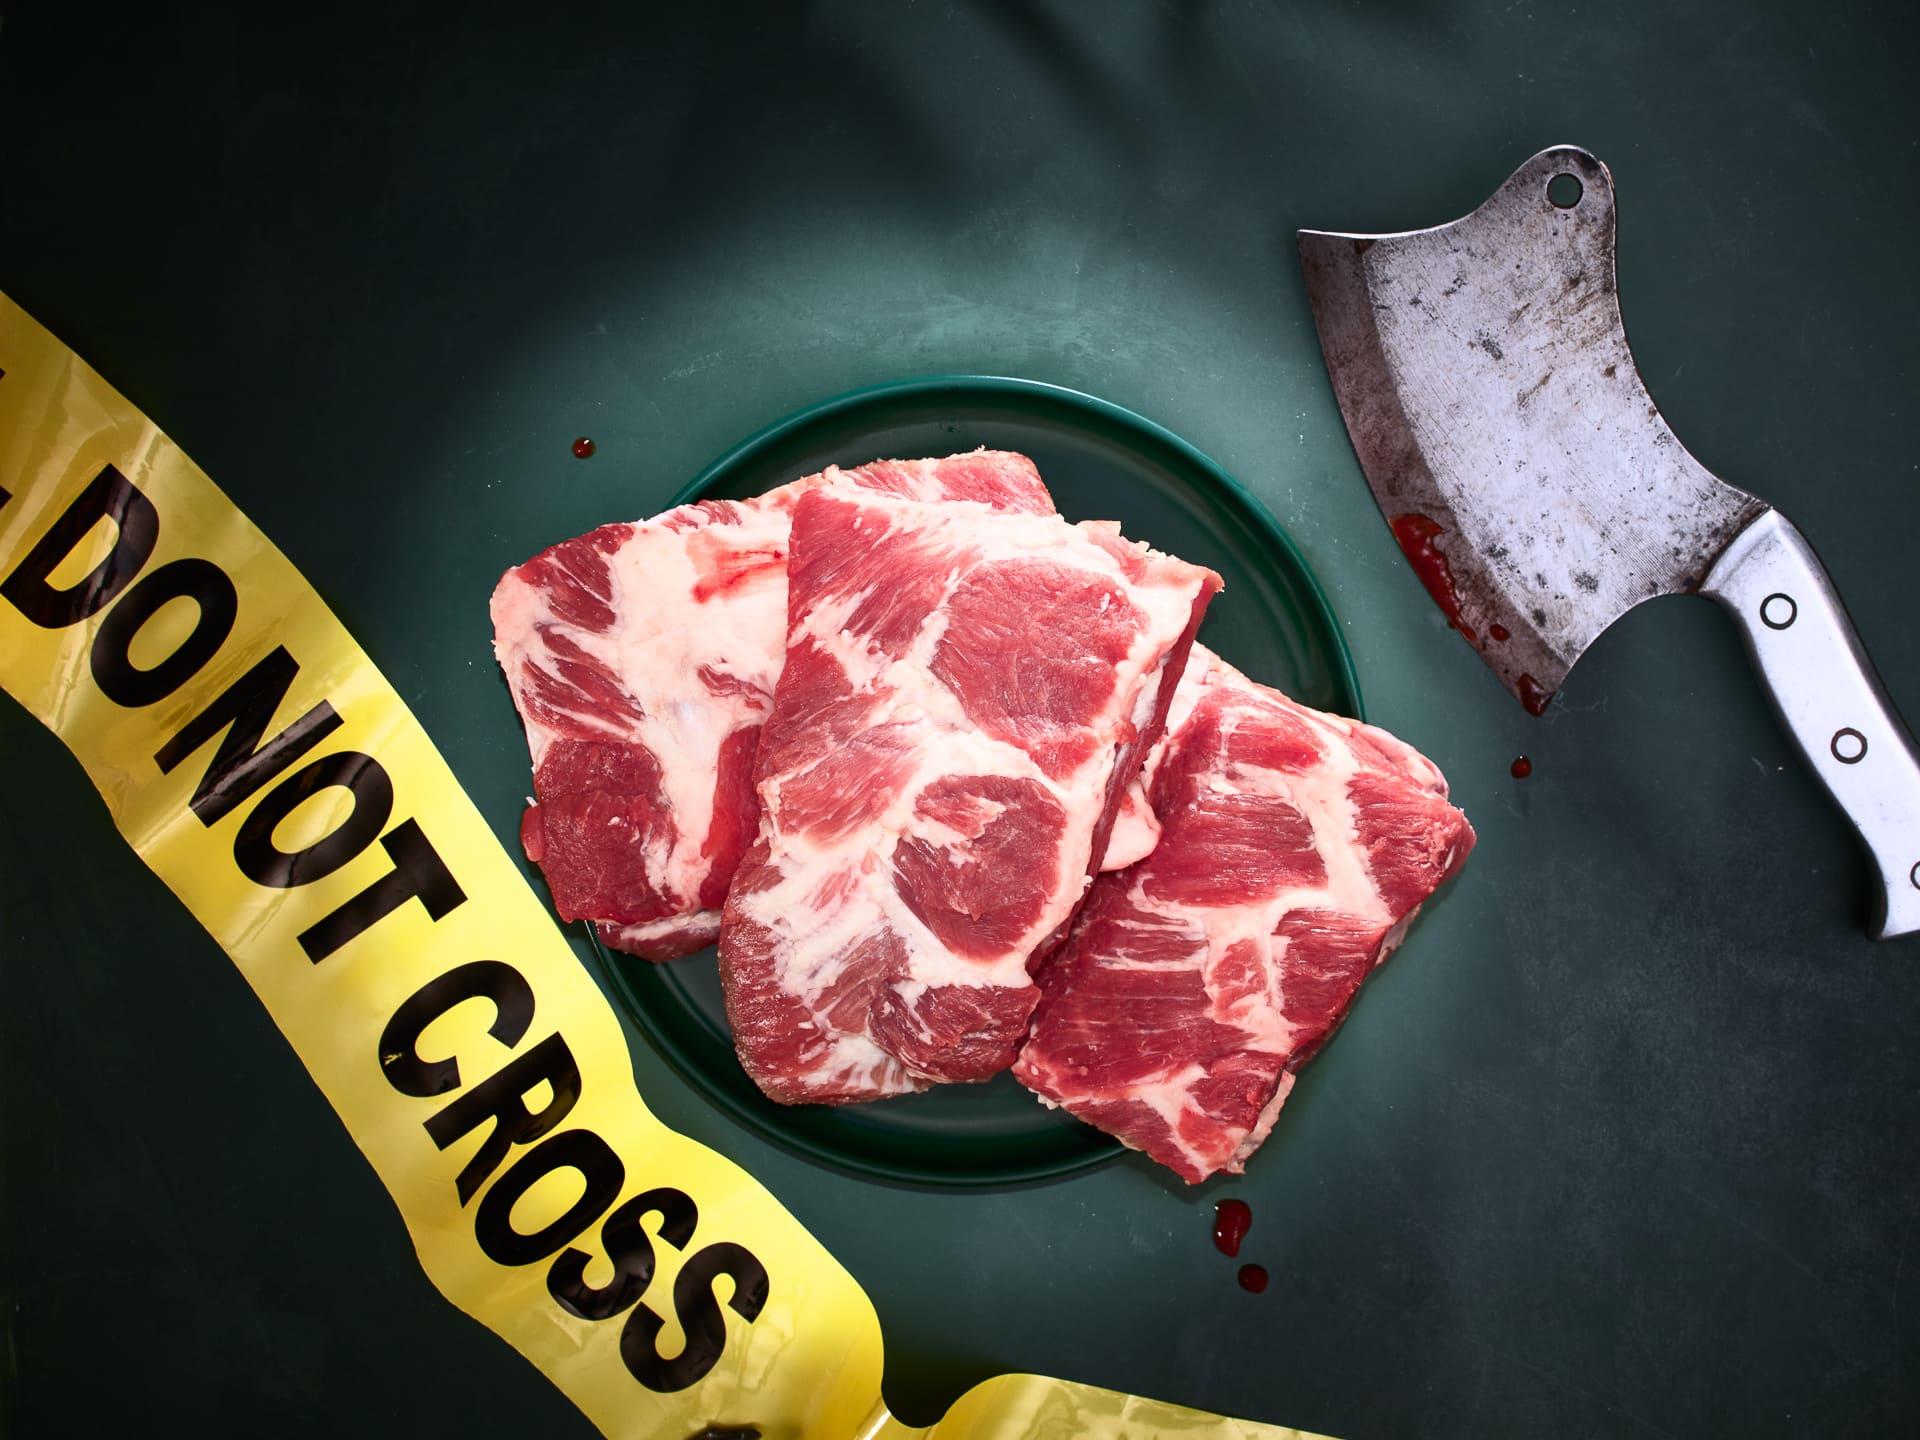 fotografo food concettuale verona CdF - Crime Scene n2 - pork ribs (1)